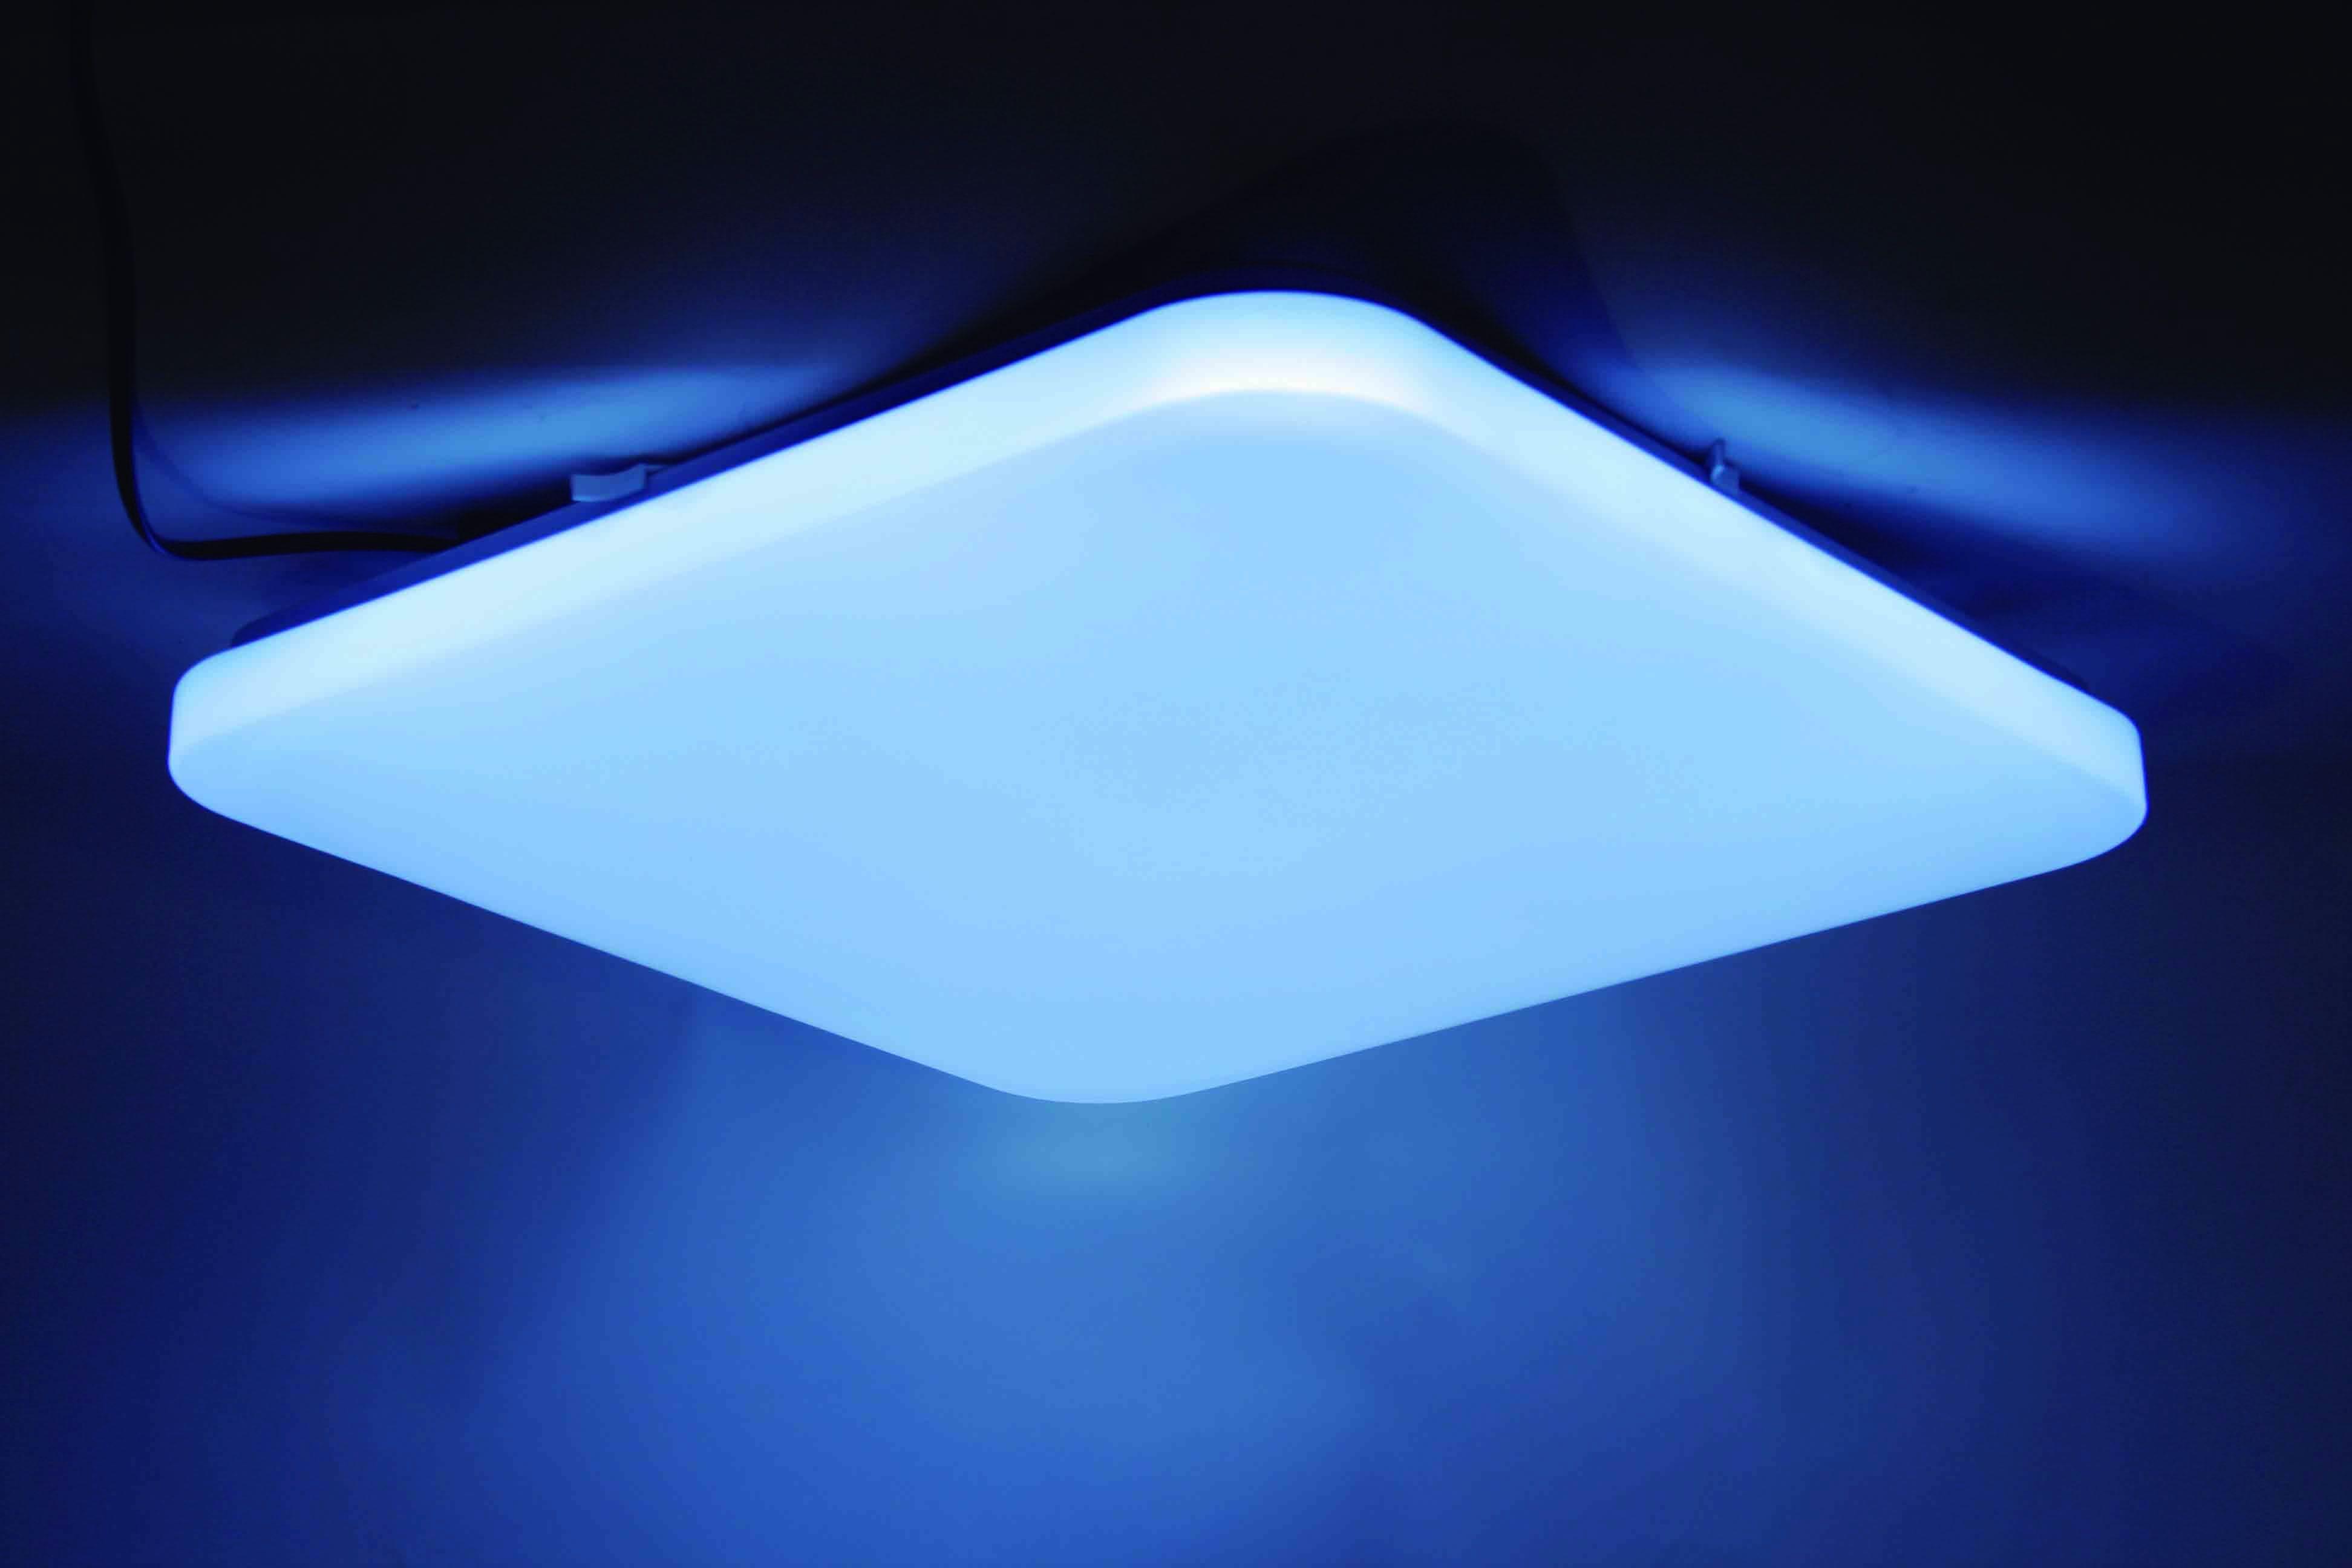 Plafoniera Led Dimabila : Corpuri de iluminat plafoniera led dimabila cu telecomanda dw w